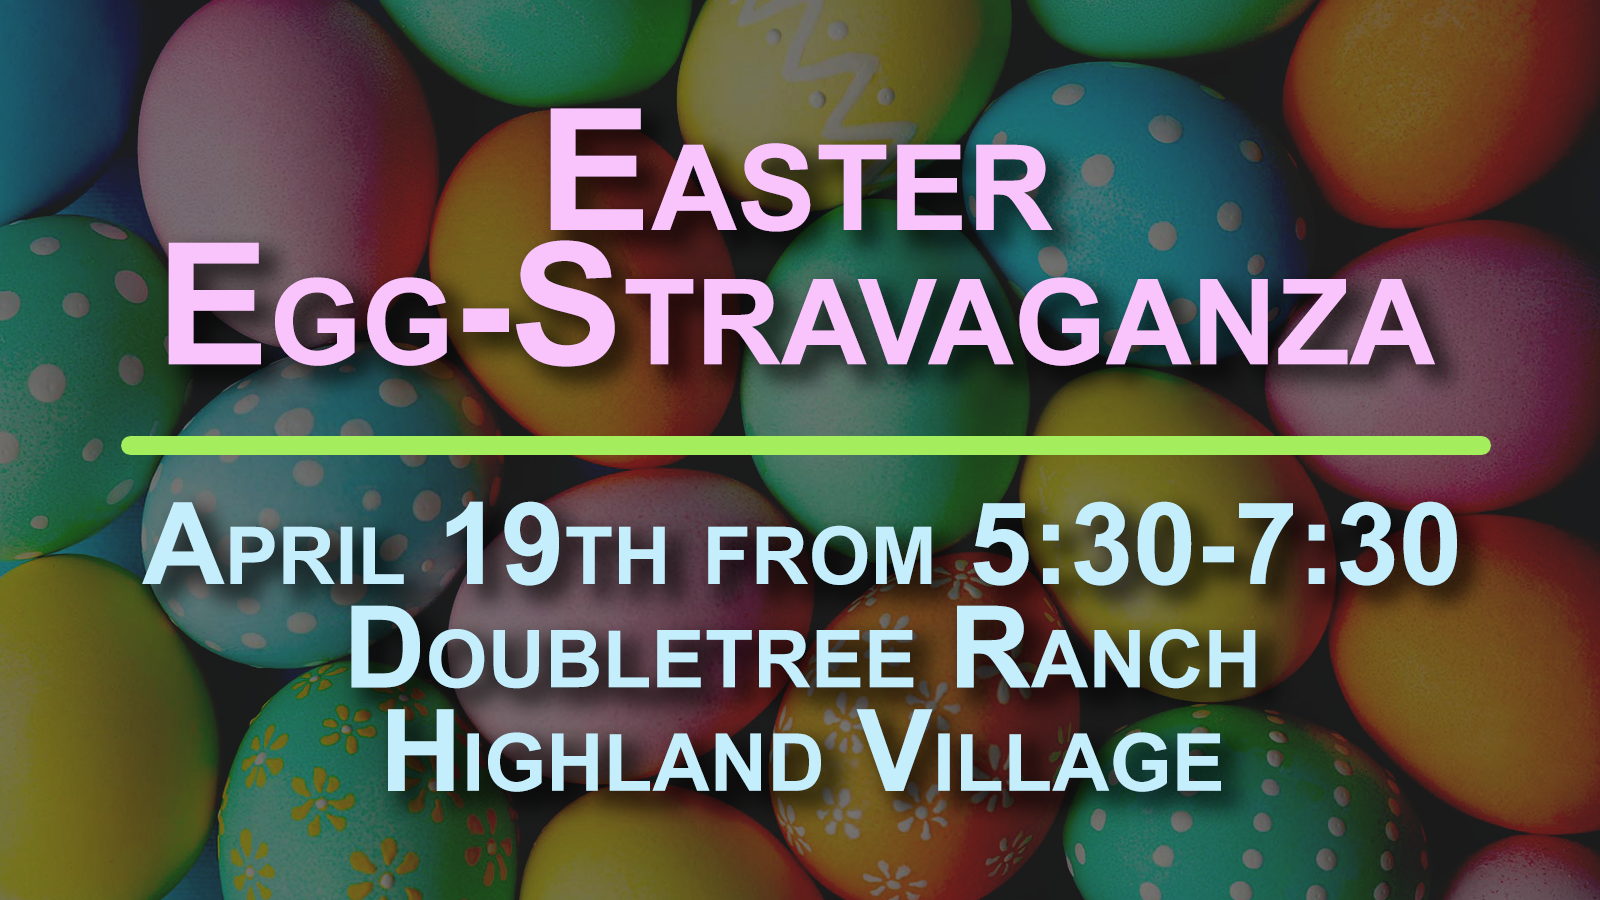 eggstravaganza - event.png